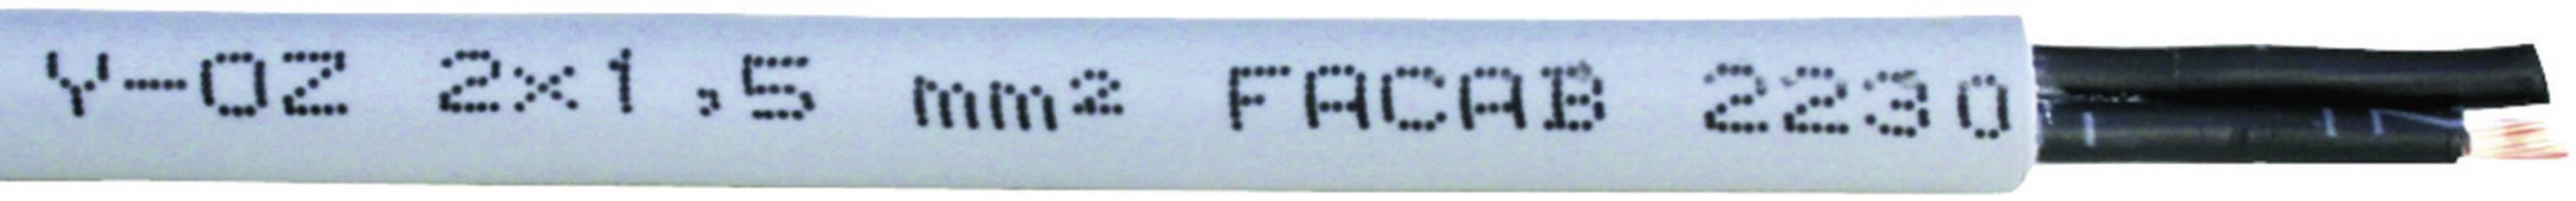 Riadiaci kábel Faber Kabel YSLY-OZ 030625, 3 x 1.50 mm², vonkajší Ø 6.80 mm, 500 V, metrový tovar, sivá